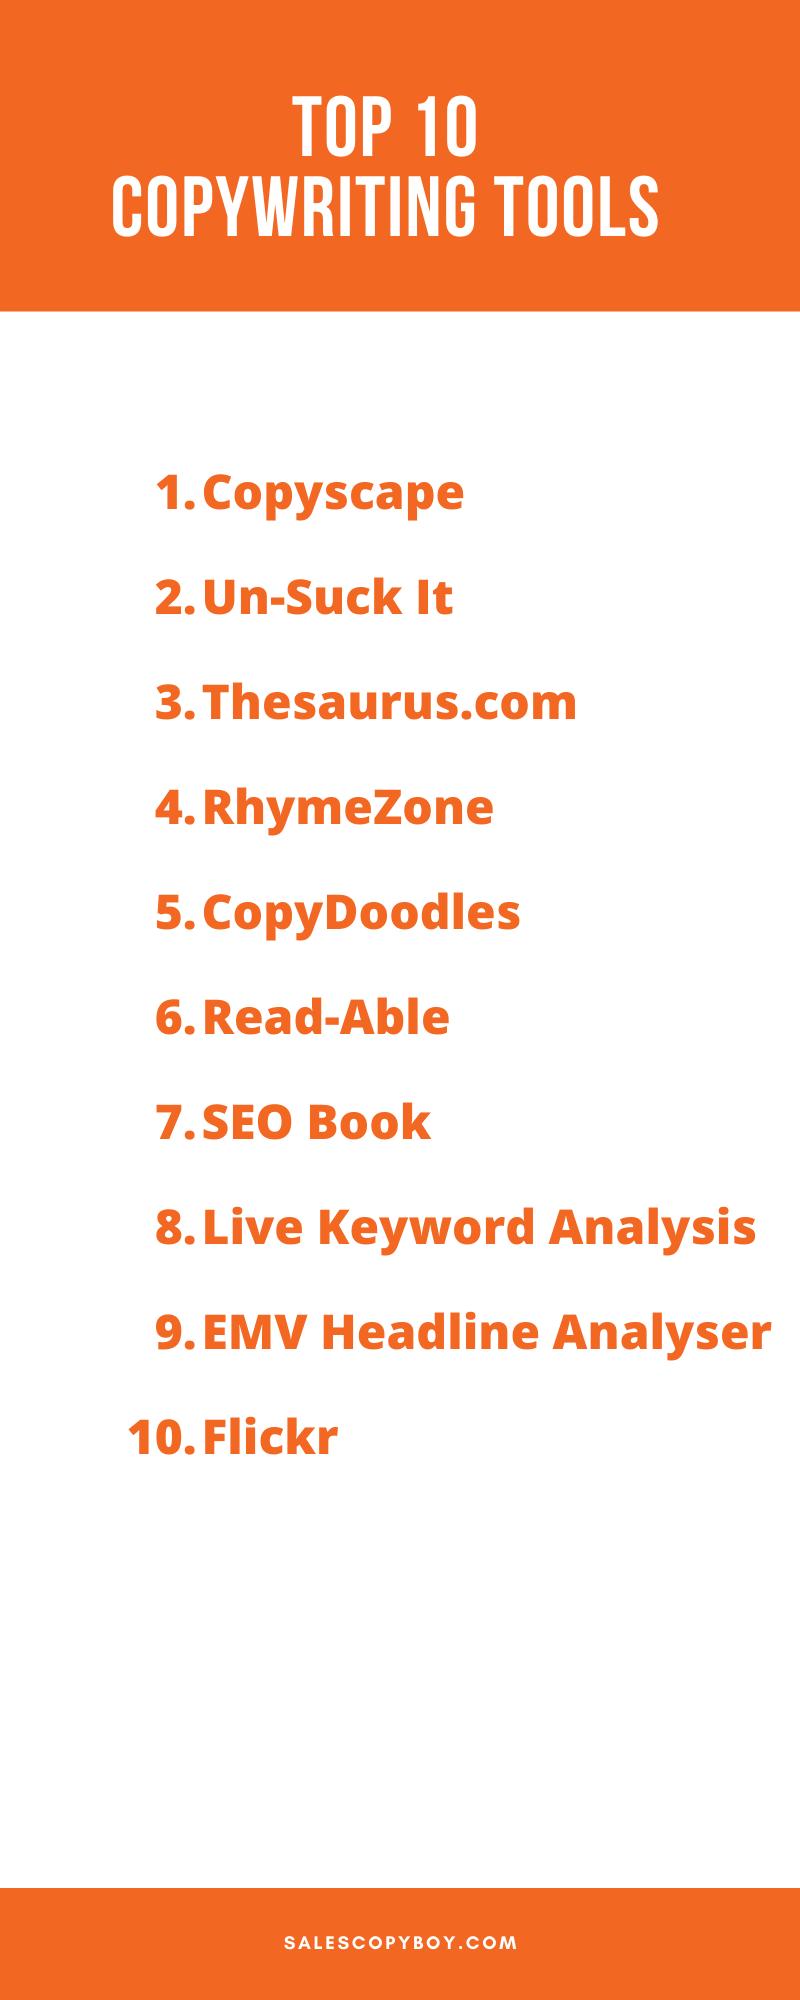 Top 10 Copywriting Tools